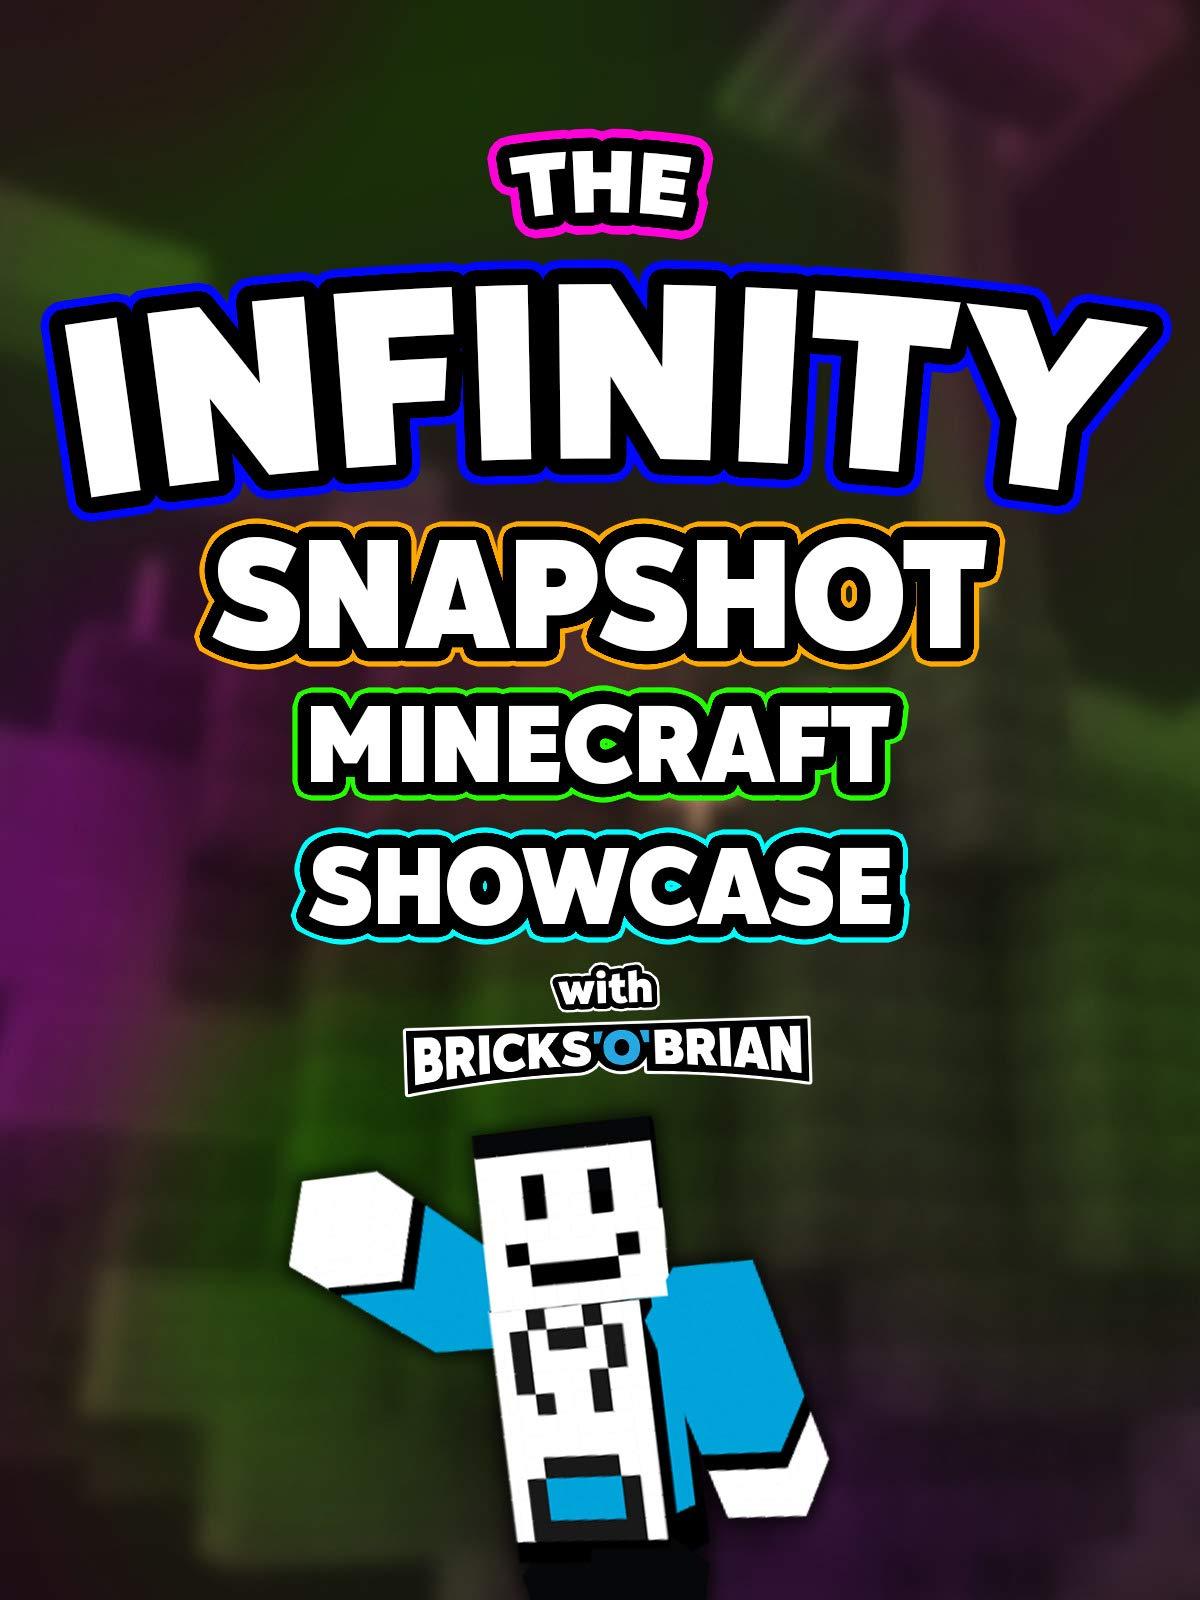 Clip: The Infinity Snapshot Minecraft Showcase with Bricks 'O' Brian!